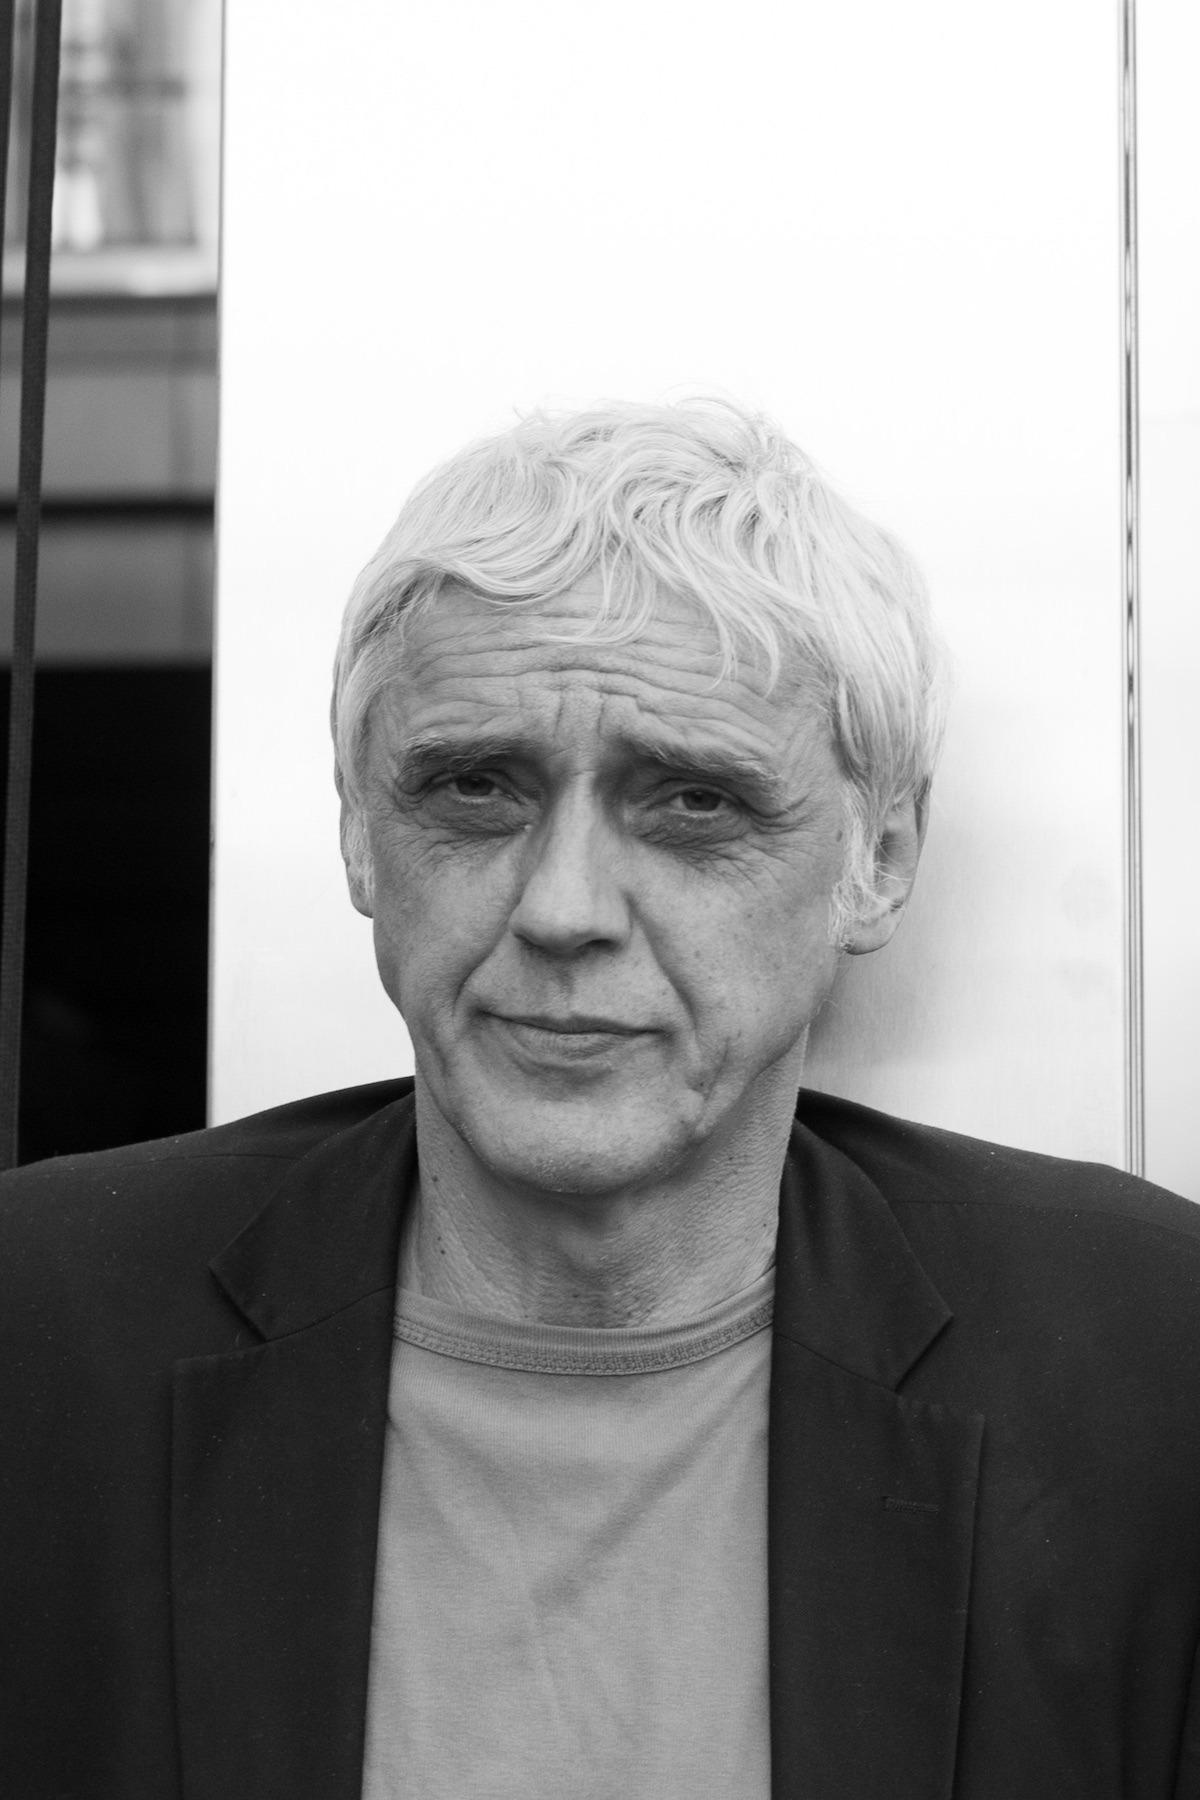 Josef Nadj - Artiste - Omma - TRR Villejuif